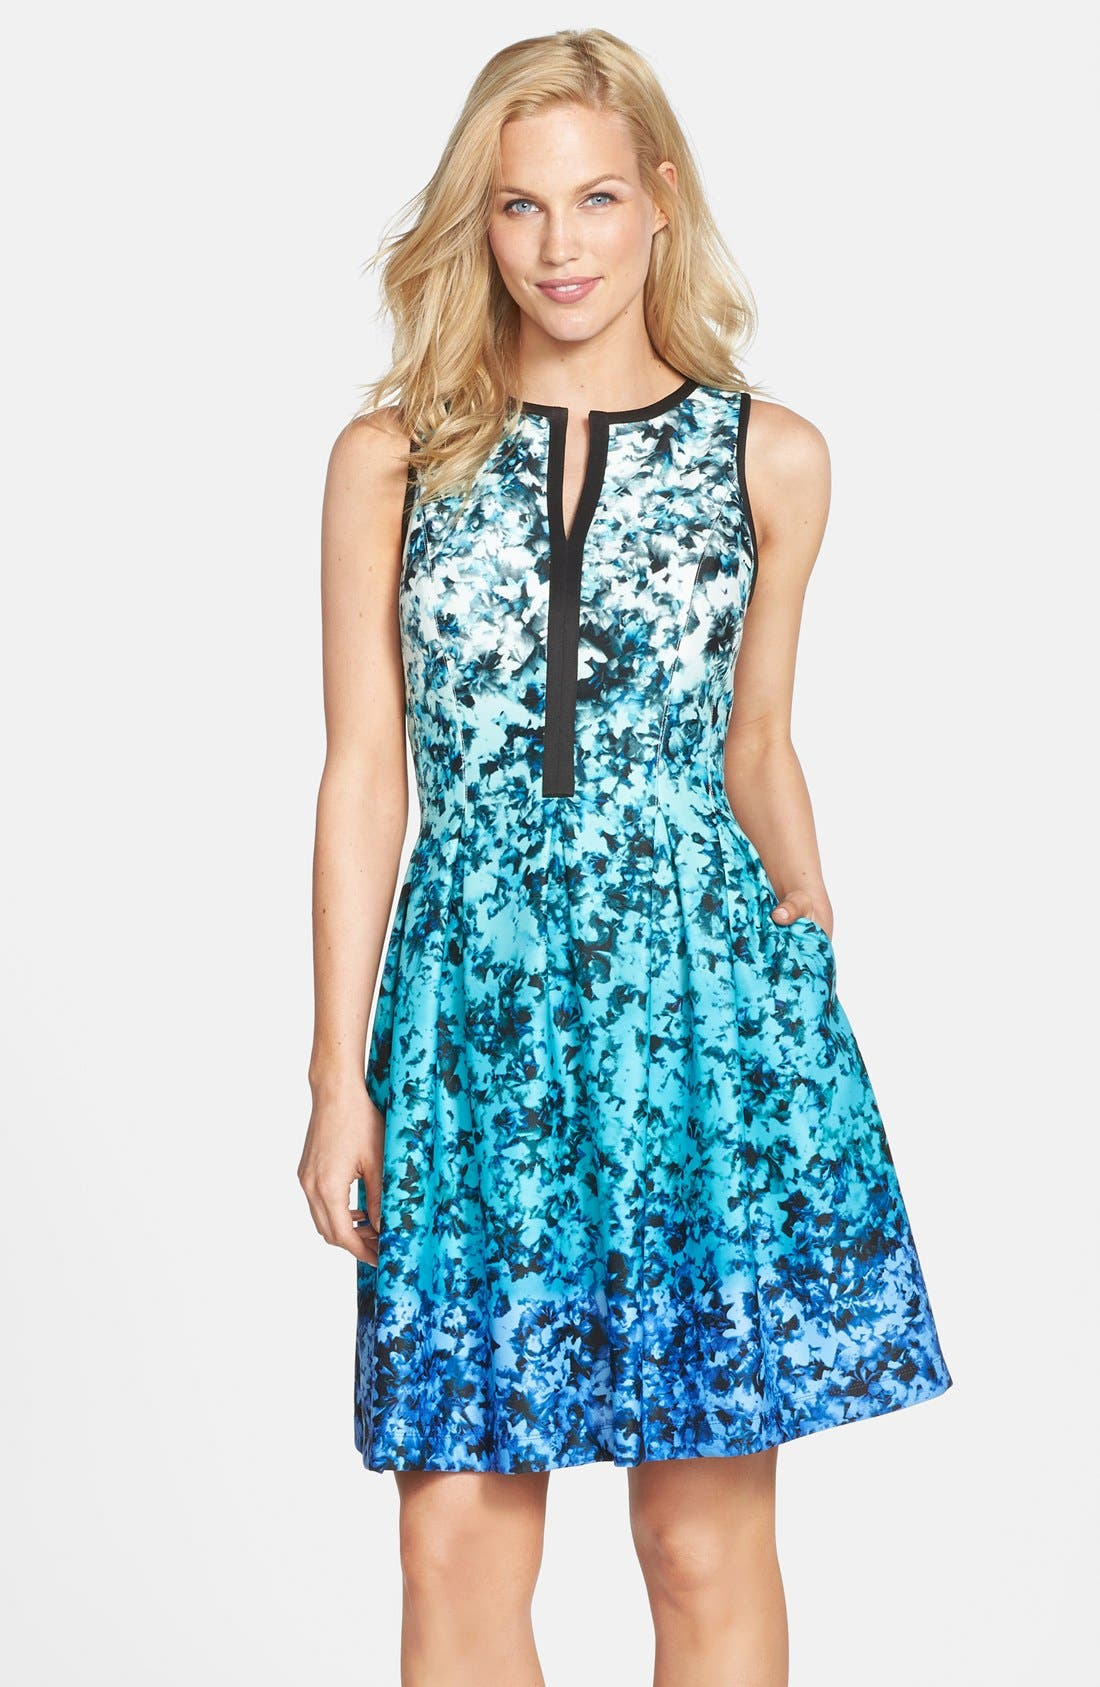 Alternate Image 1 Selected - Vince Camuto Ombré Floral Print Sleeveless Fit & Flare Dress (Regular & Petite)